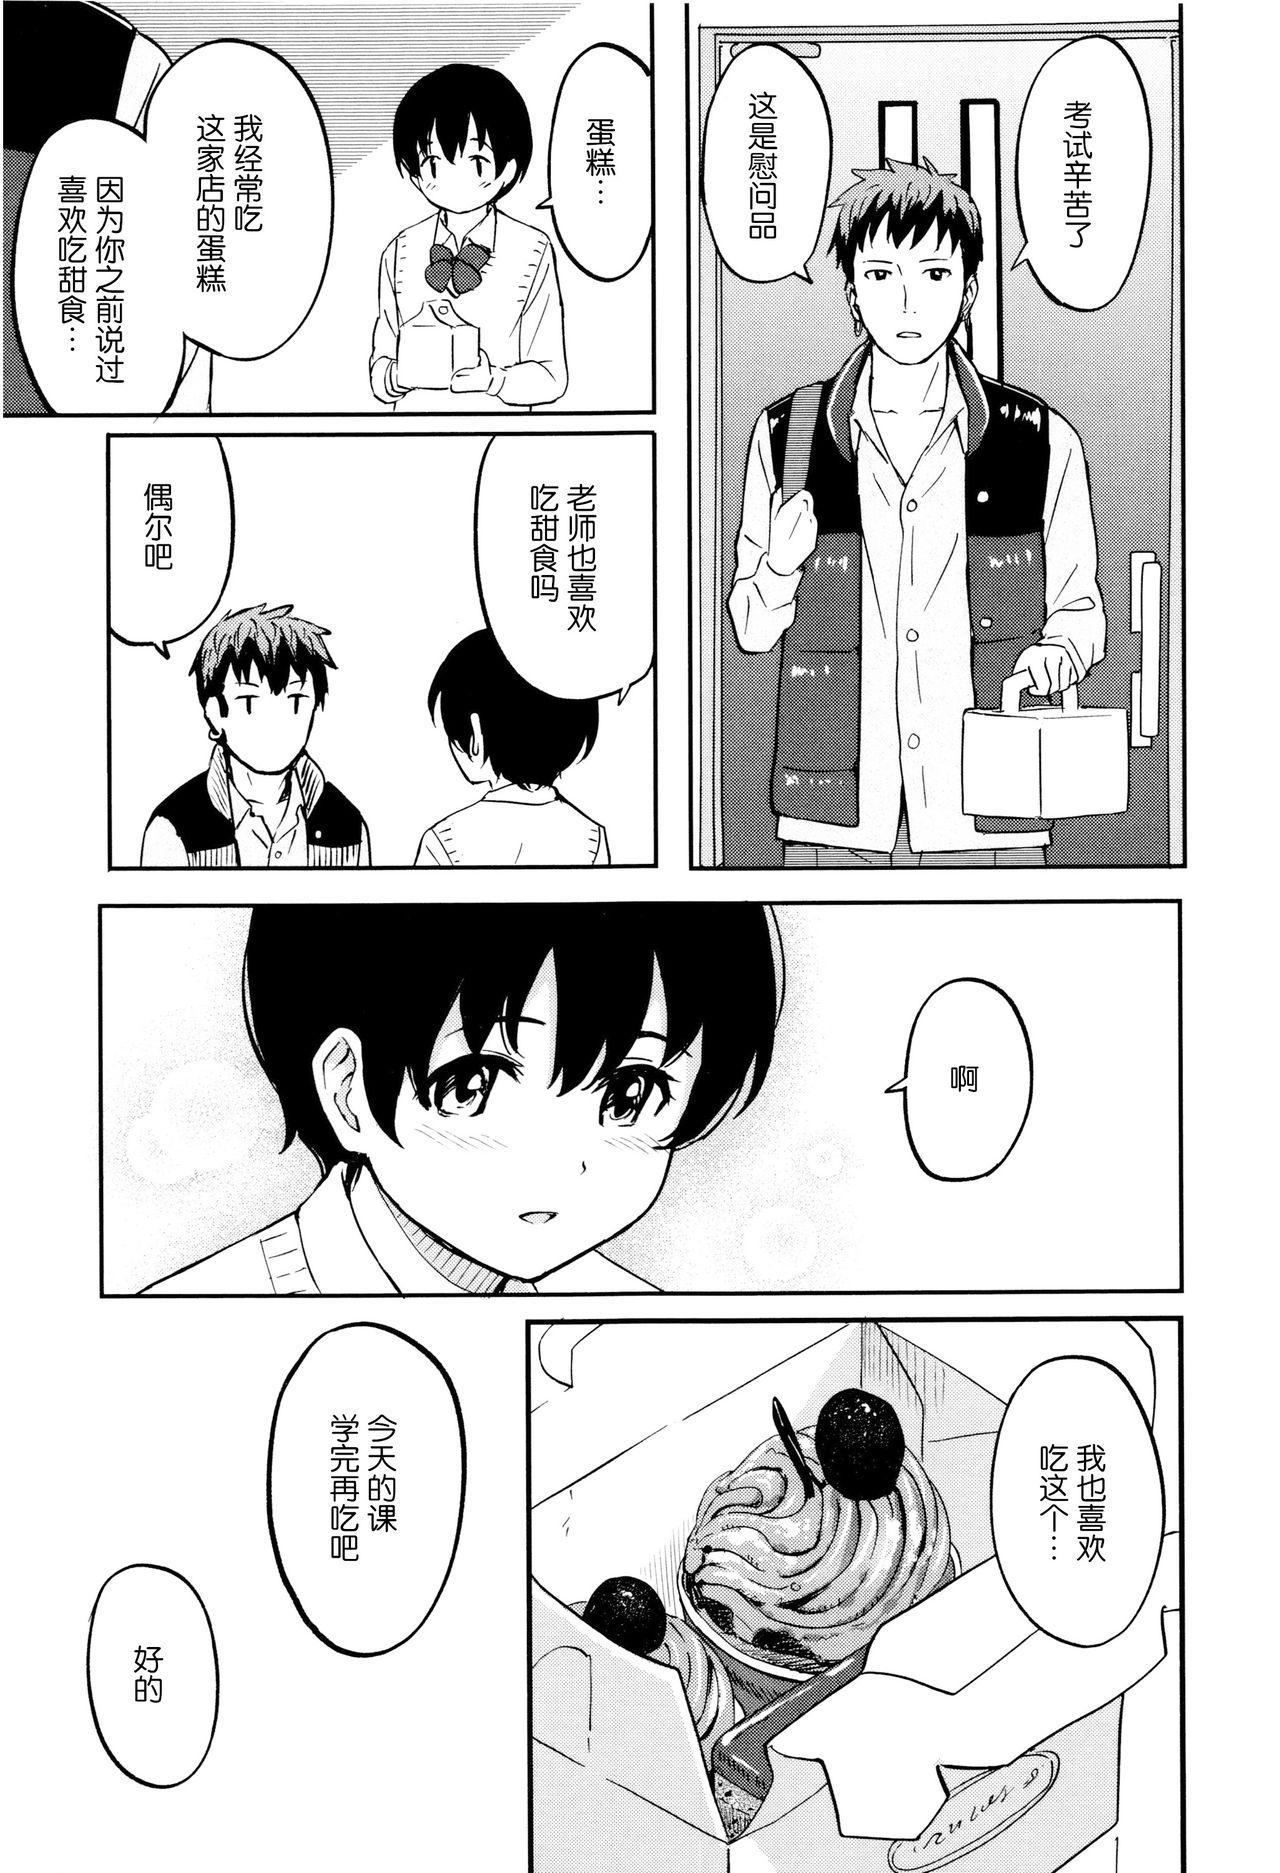 Tokubetsu na Mainichi - Special daily 139